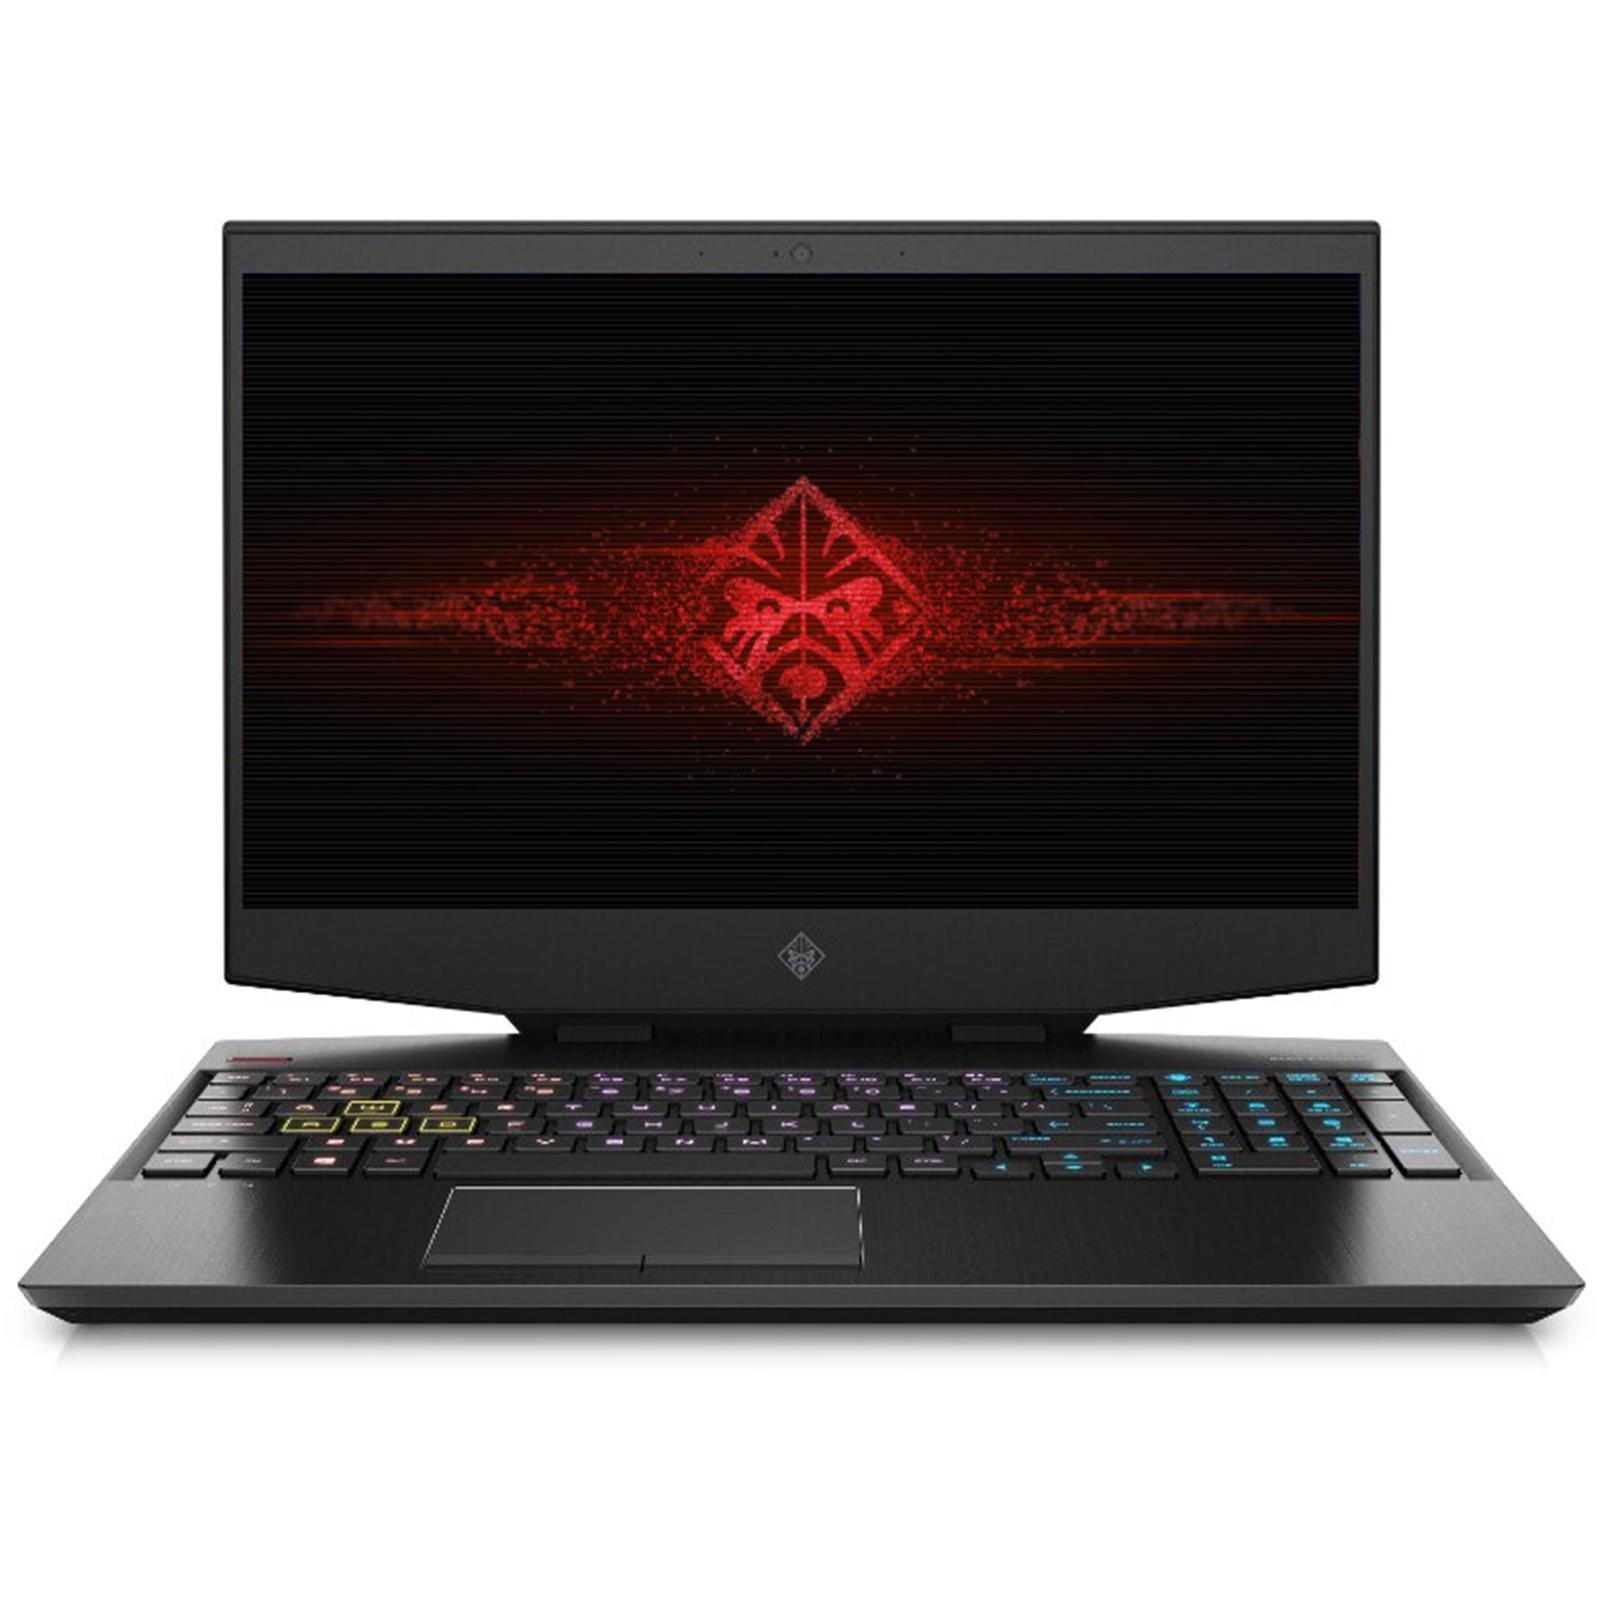 Buy The Hp Omen 15 Rtx 2080 Super Max Q Gaming Laptop 15 6 Fhd 300hz Screen 1n0s4pa Online Pbtech Co Nz